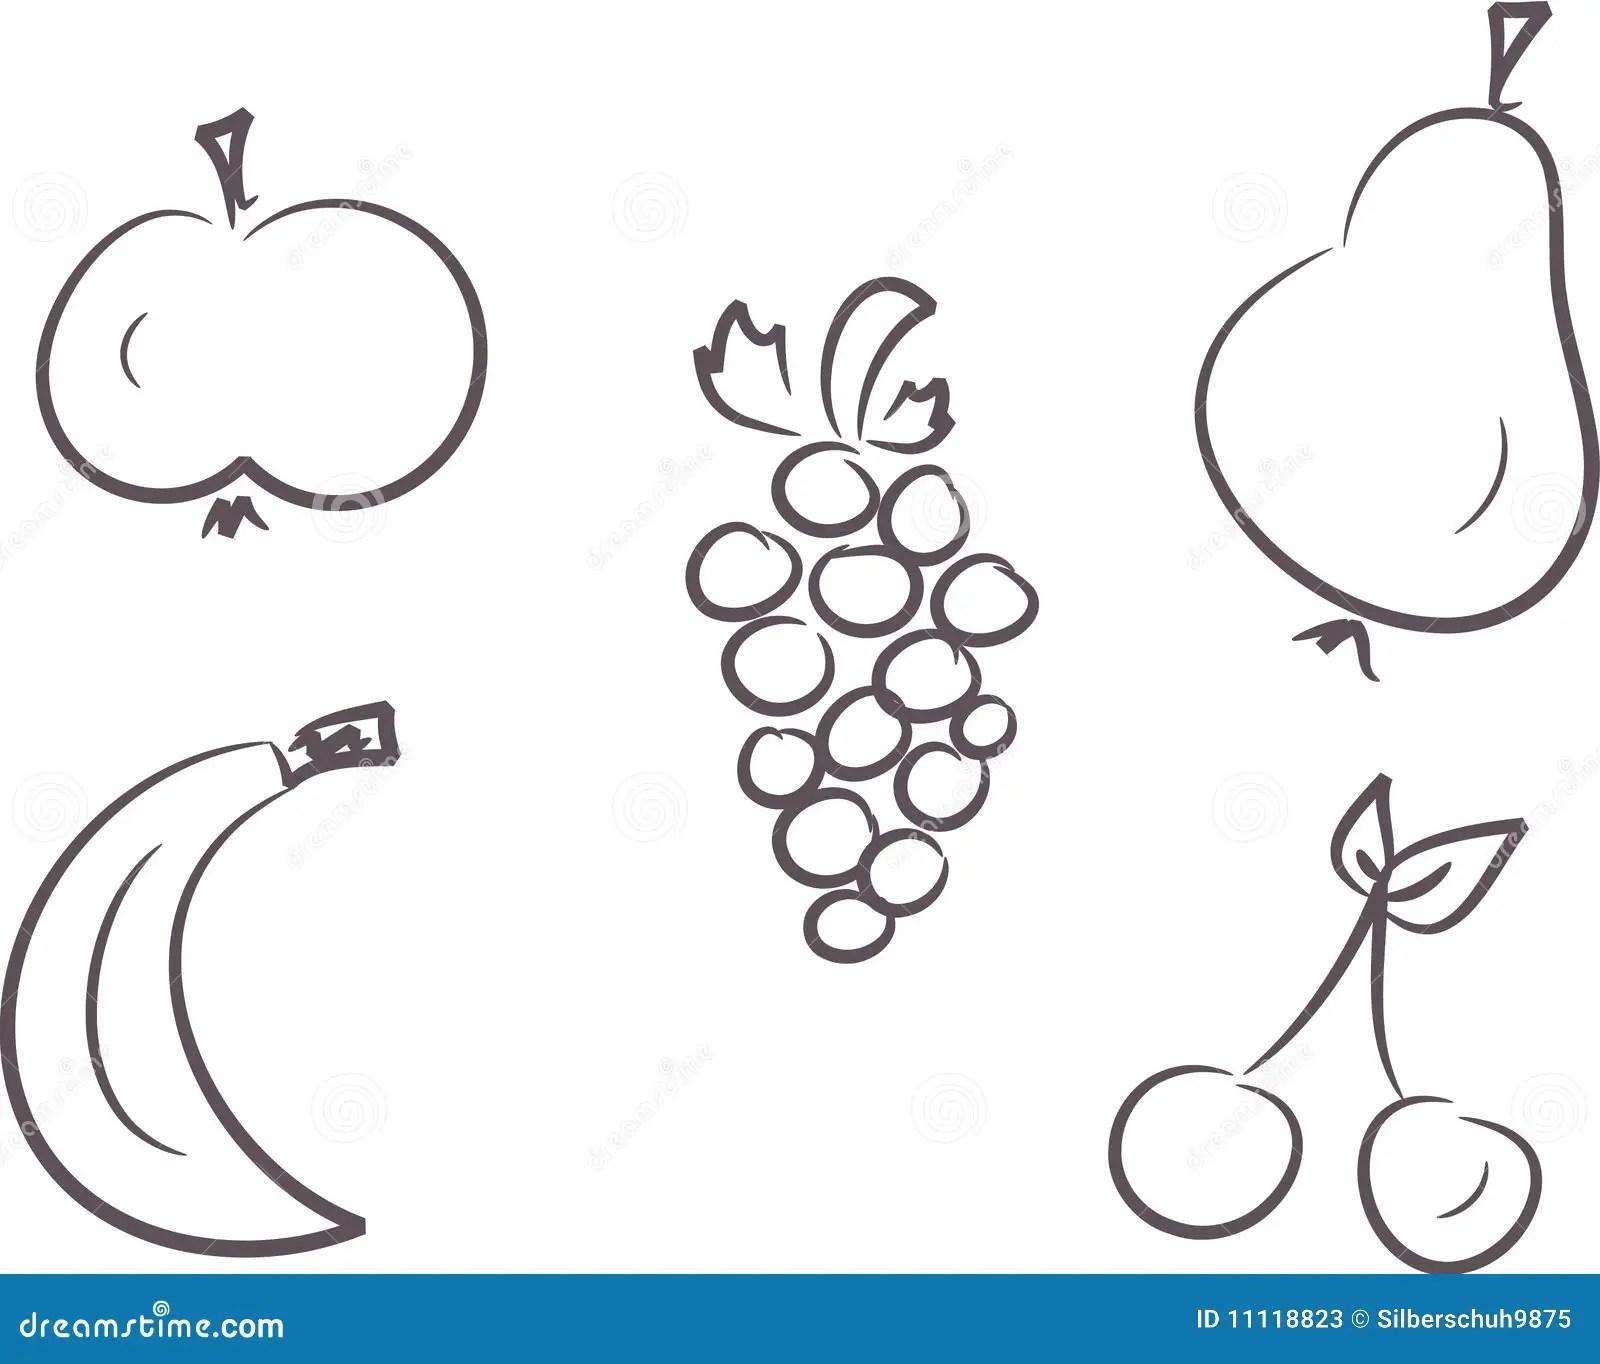 Clip Art Set Fruits Stock Photos